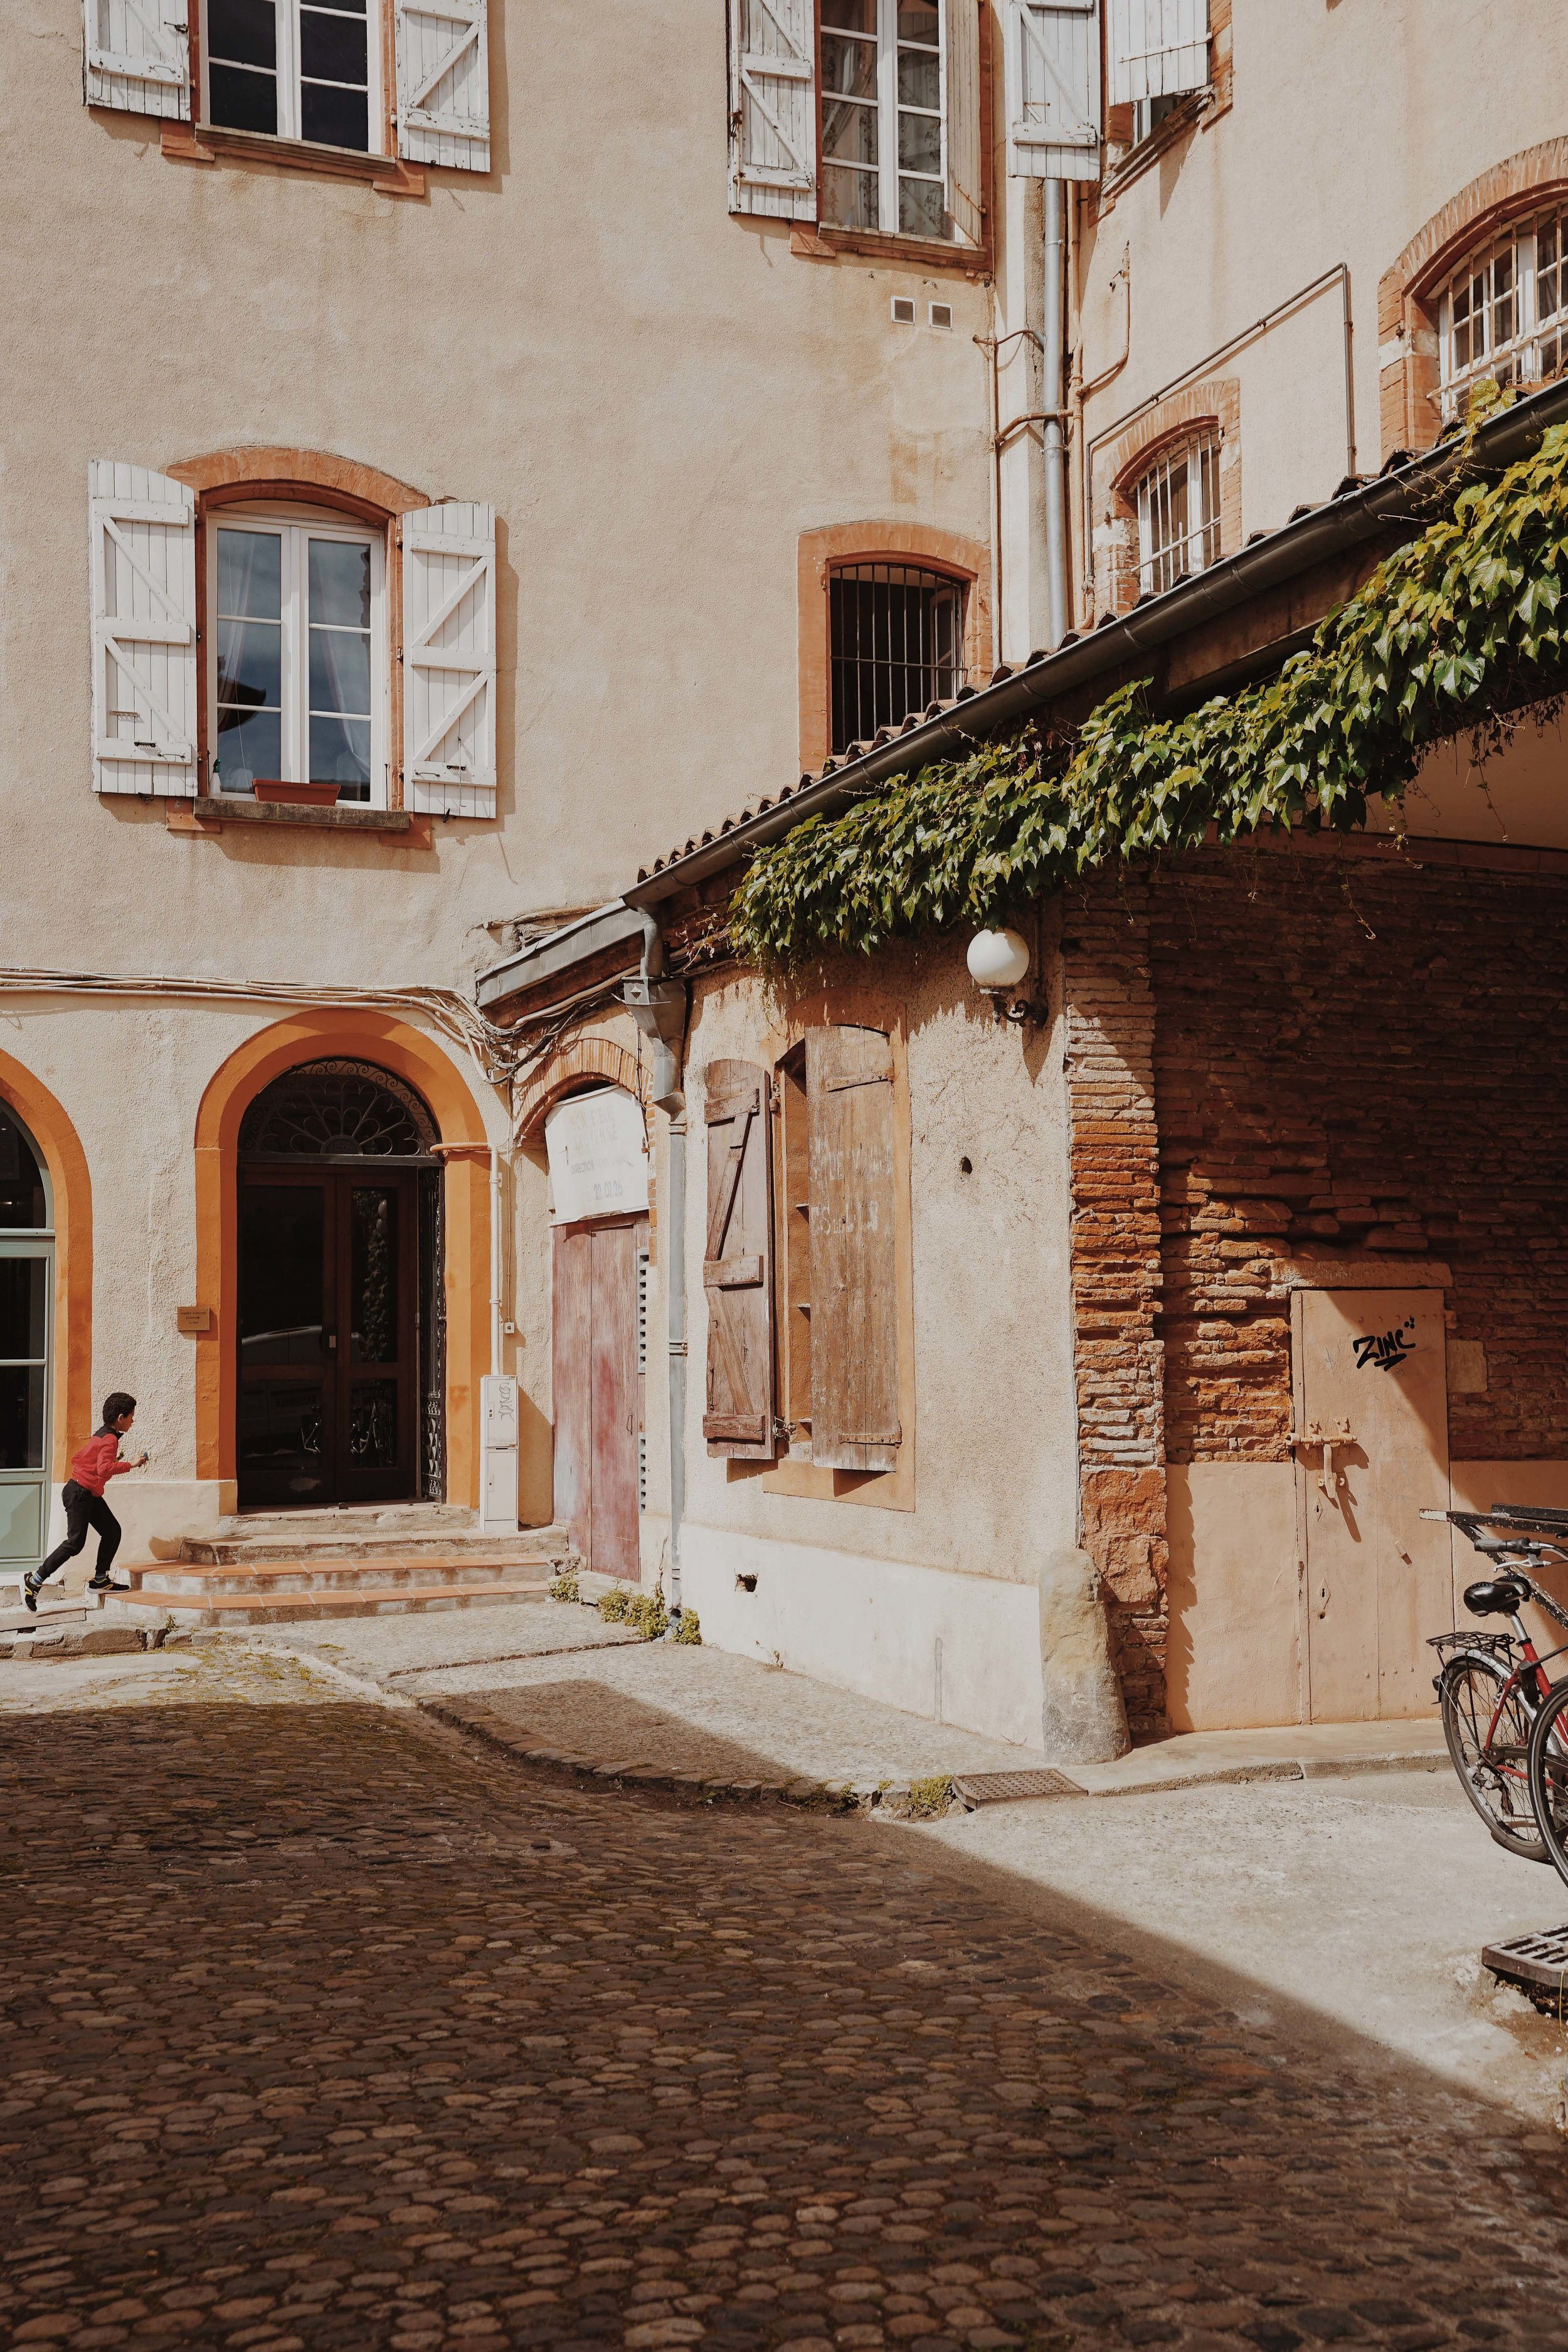 ASROSENVINGE_AtoutFrance_Occitanie_Toulouse_LowRes-6.jpg